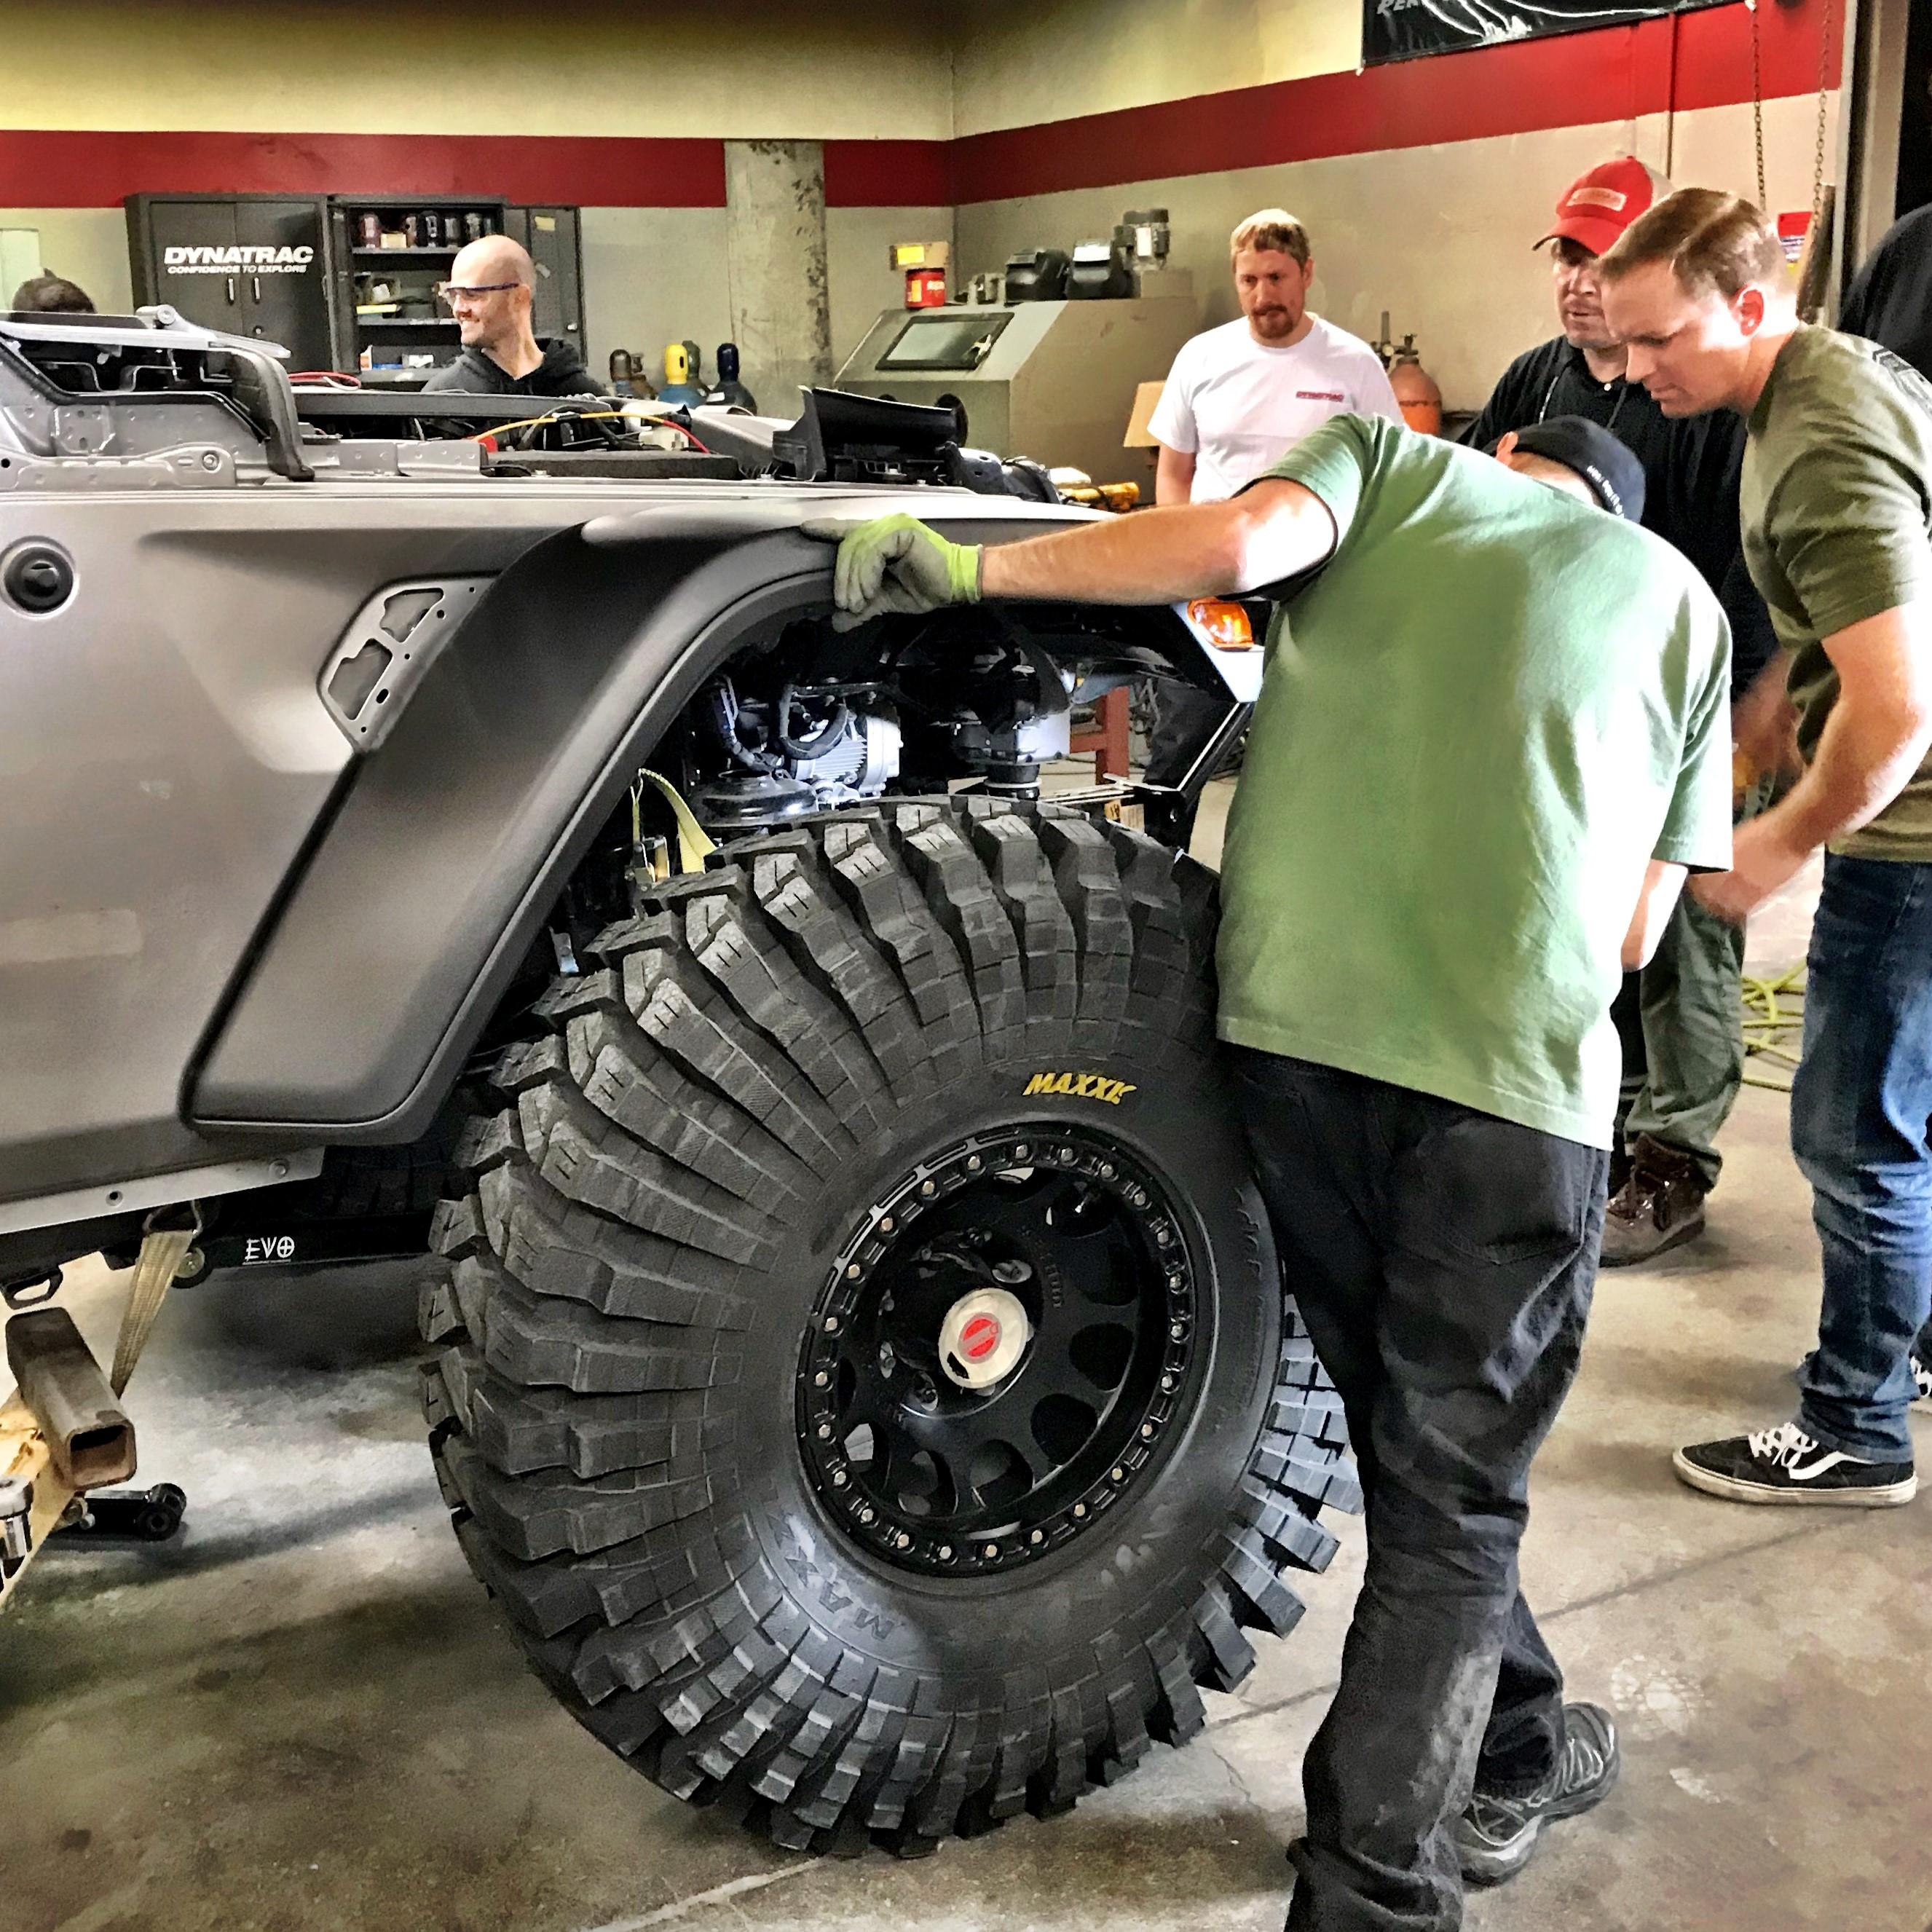 Dynatrac CODE1 2018 Jeep Wrangler JL Build - Dynatrac Tech